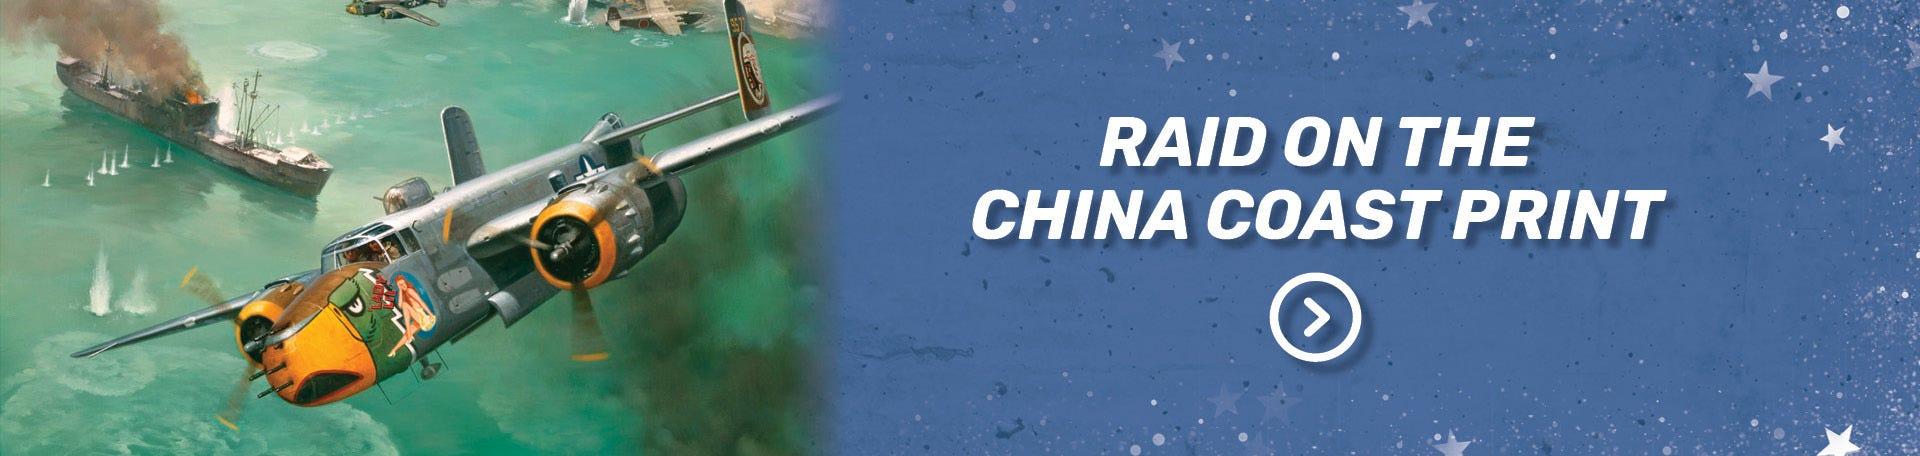 Raid on China